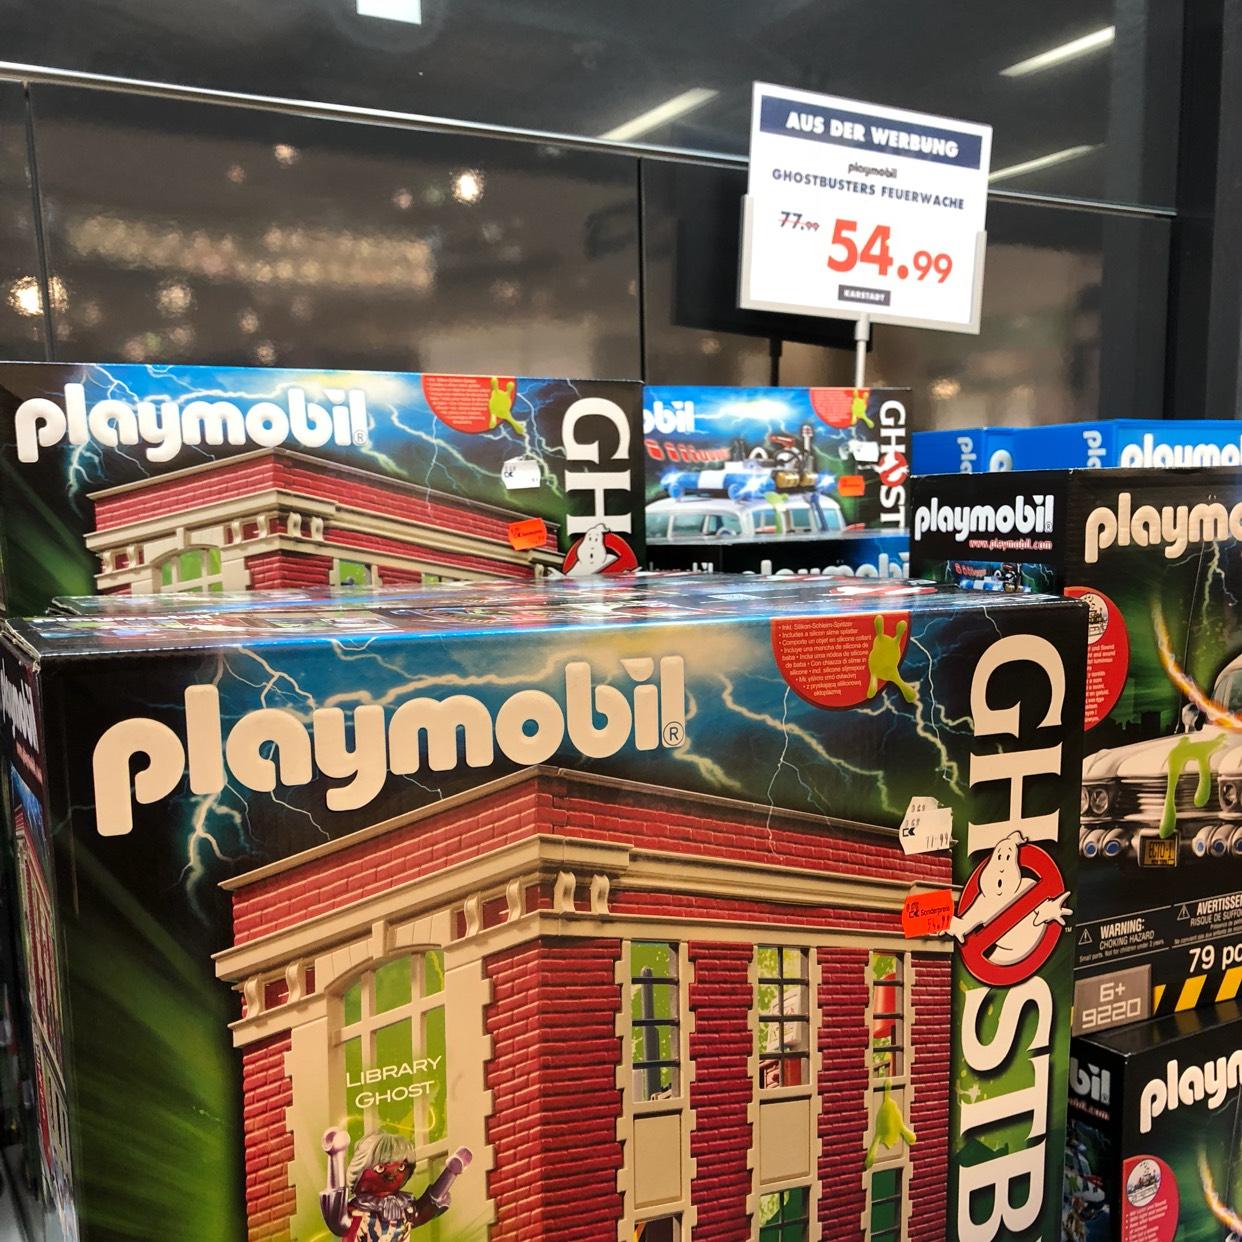 LOKAL Hamburg und online : Playmobil Ghostbusters Feuerwehrwache